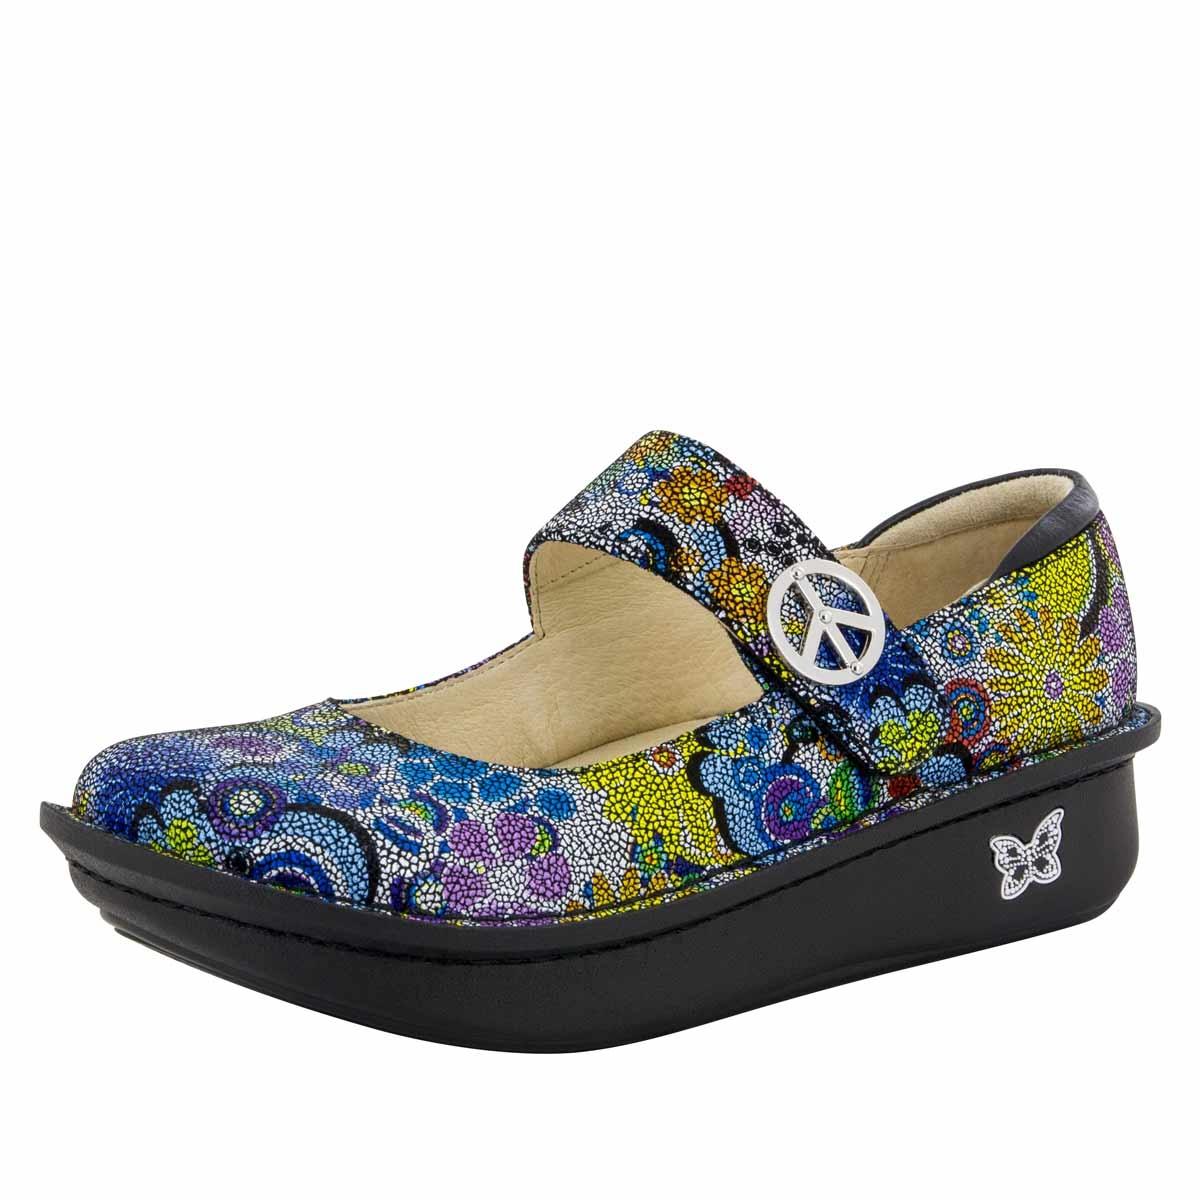 Alegria Shoes Paloma Hippie Chic Dottie Mary Jane